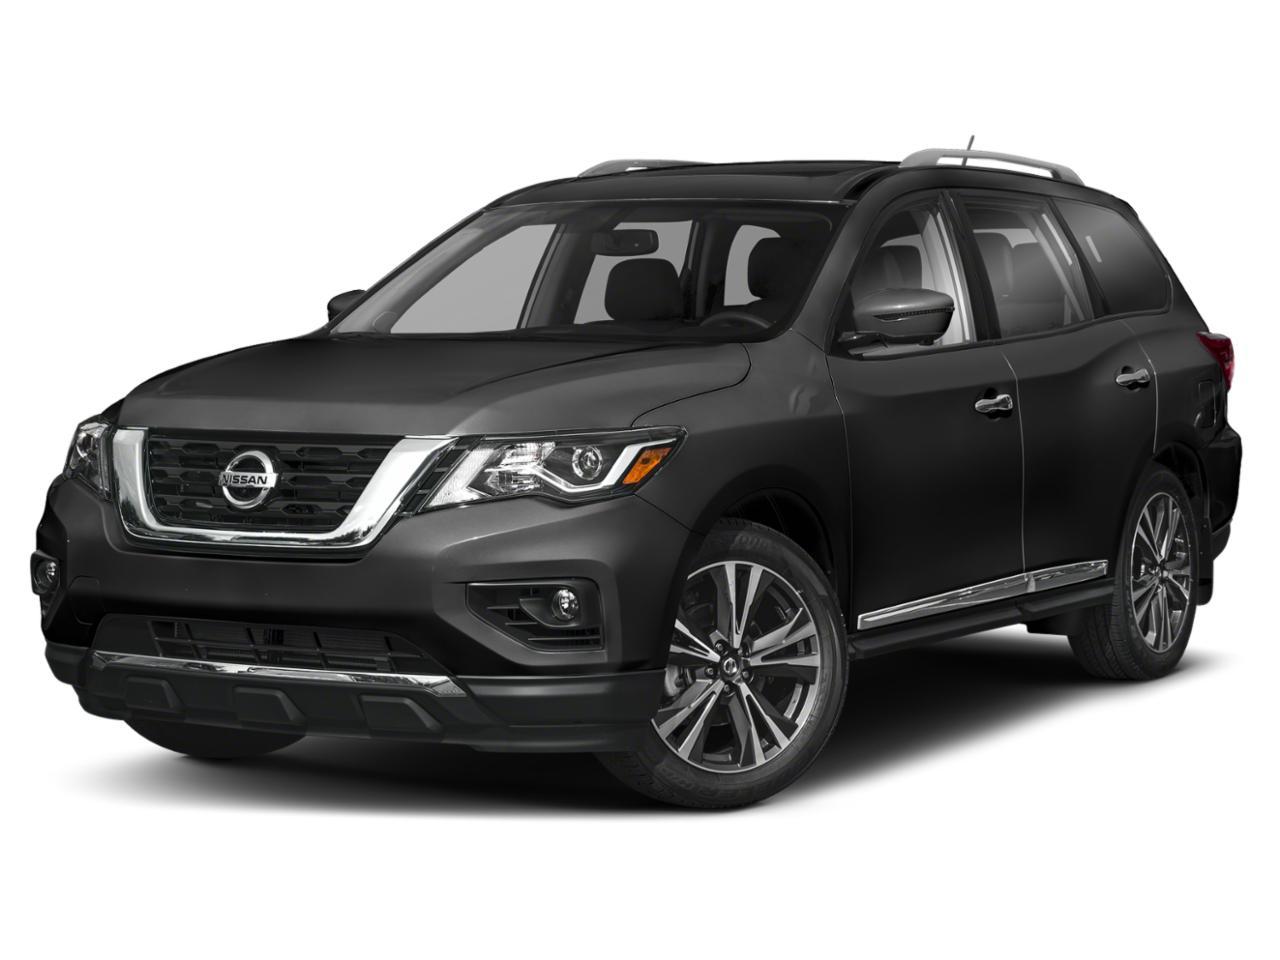 2018 Nissan Pathfinder Vehicle Photo in Stafford, TX 77477